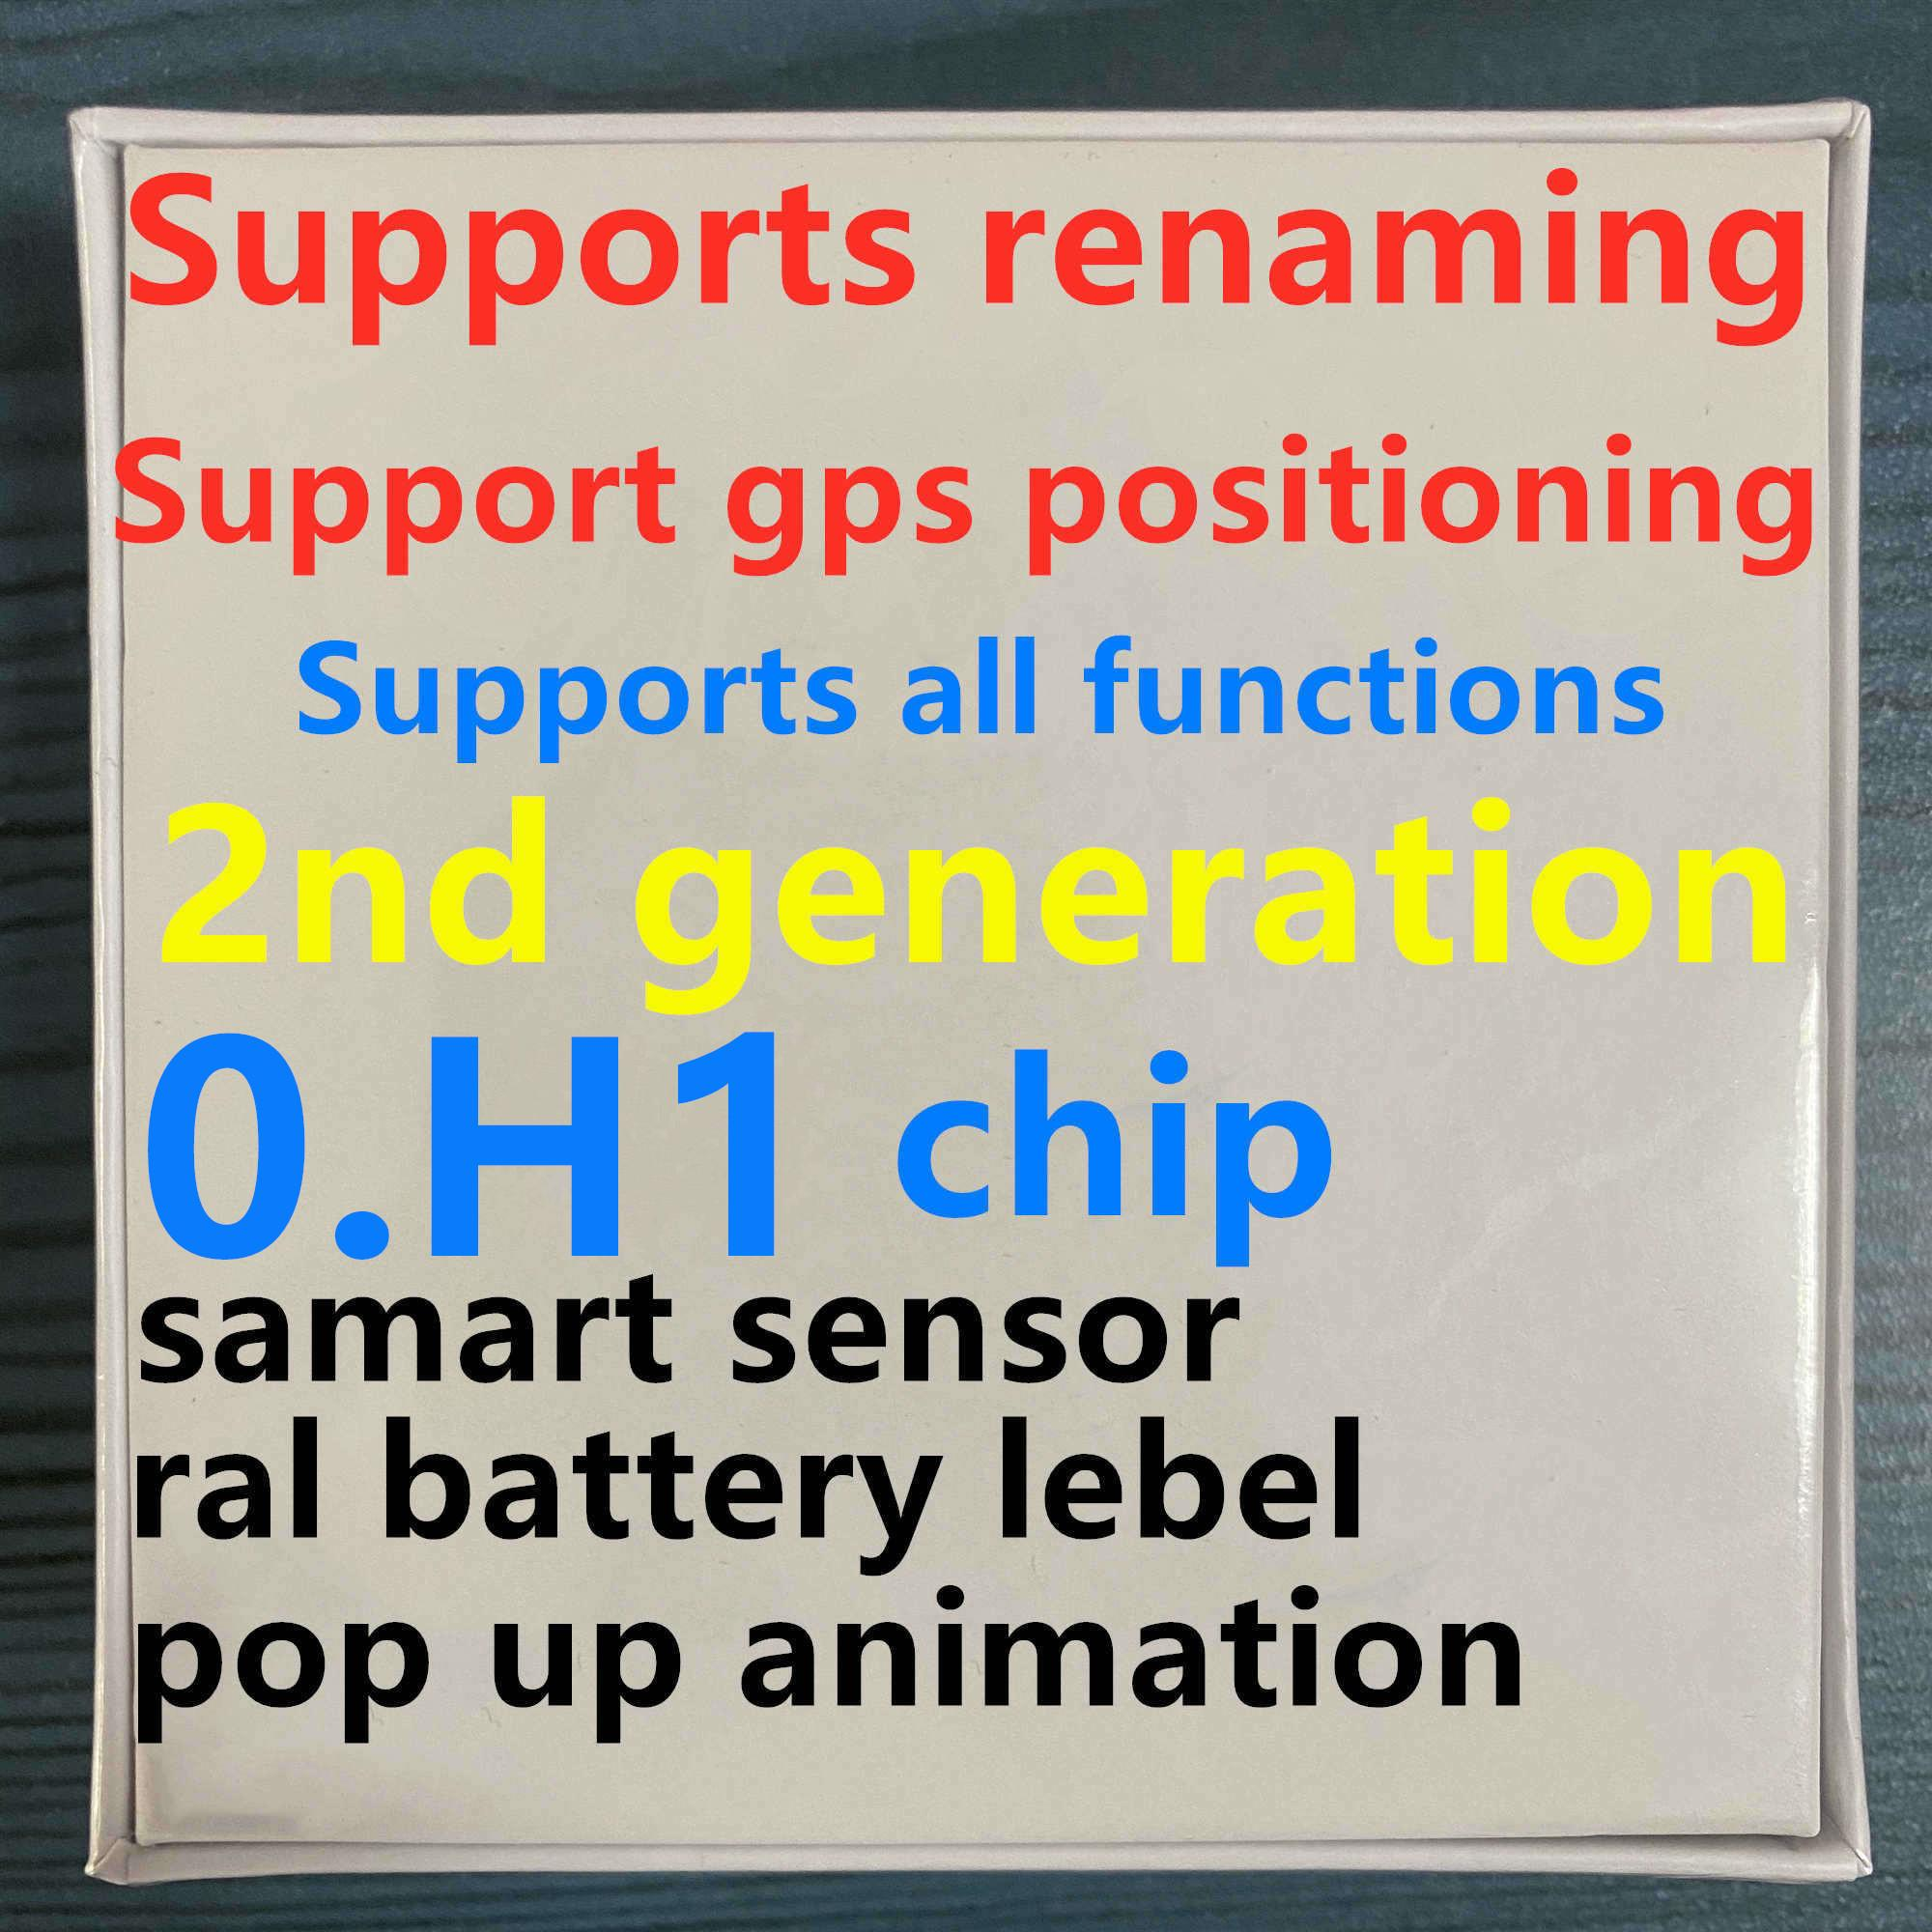 H1 이어폰 칩 GPS를 이름 바꾸기 에어 AP3 2 개 포드는 무선 충전 케이스 이어폰을 페어링 창 블루투스 헤드폰 자동 팝업 AP2 TWS 세대 프로